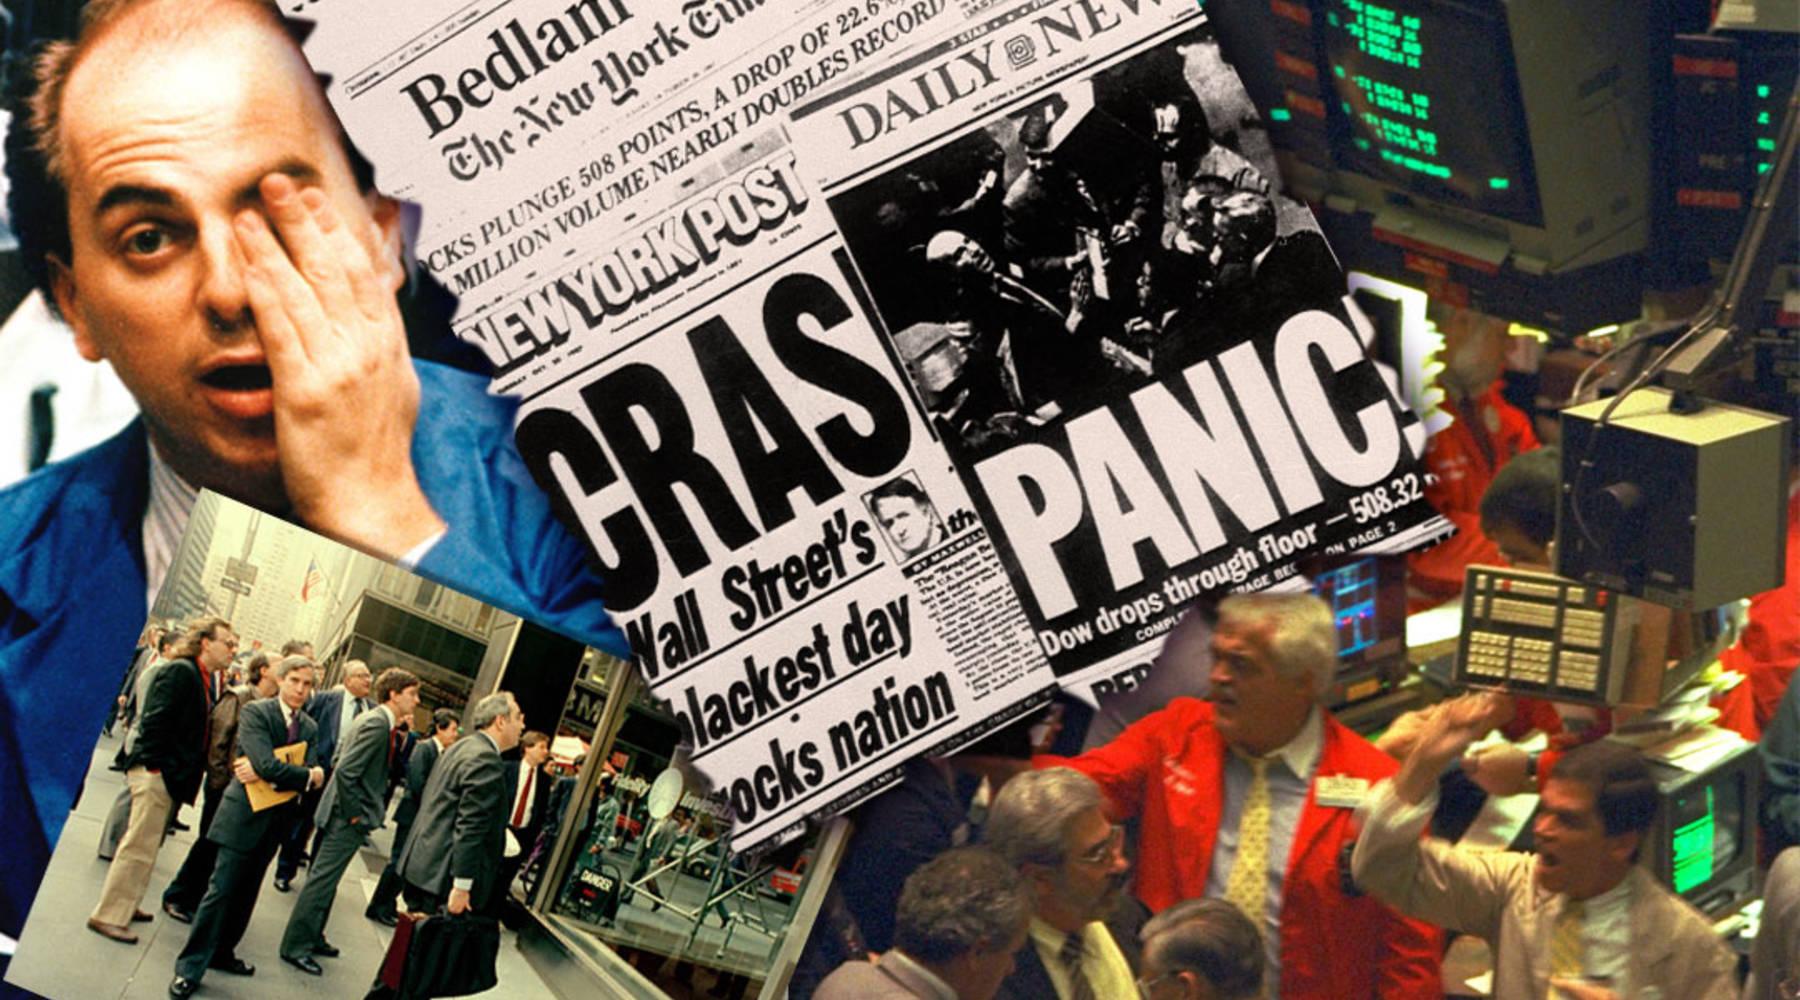 Looking back on Black Monday, the stock market crash of 1987